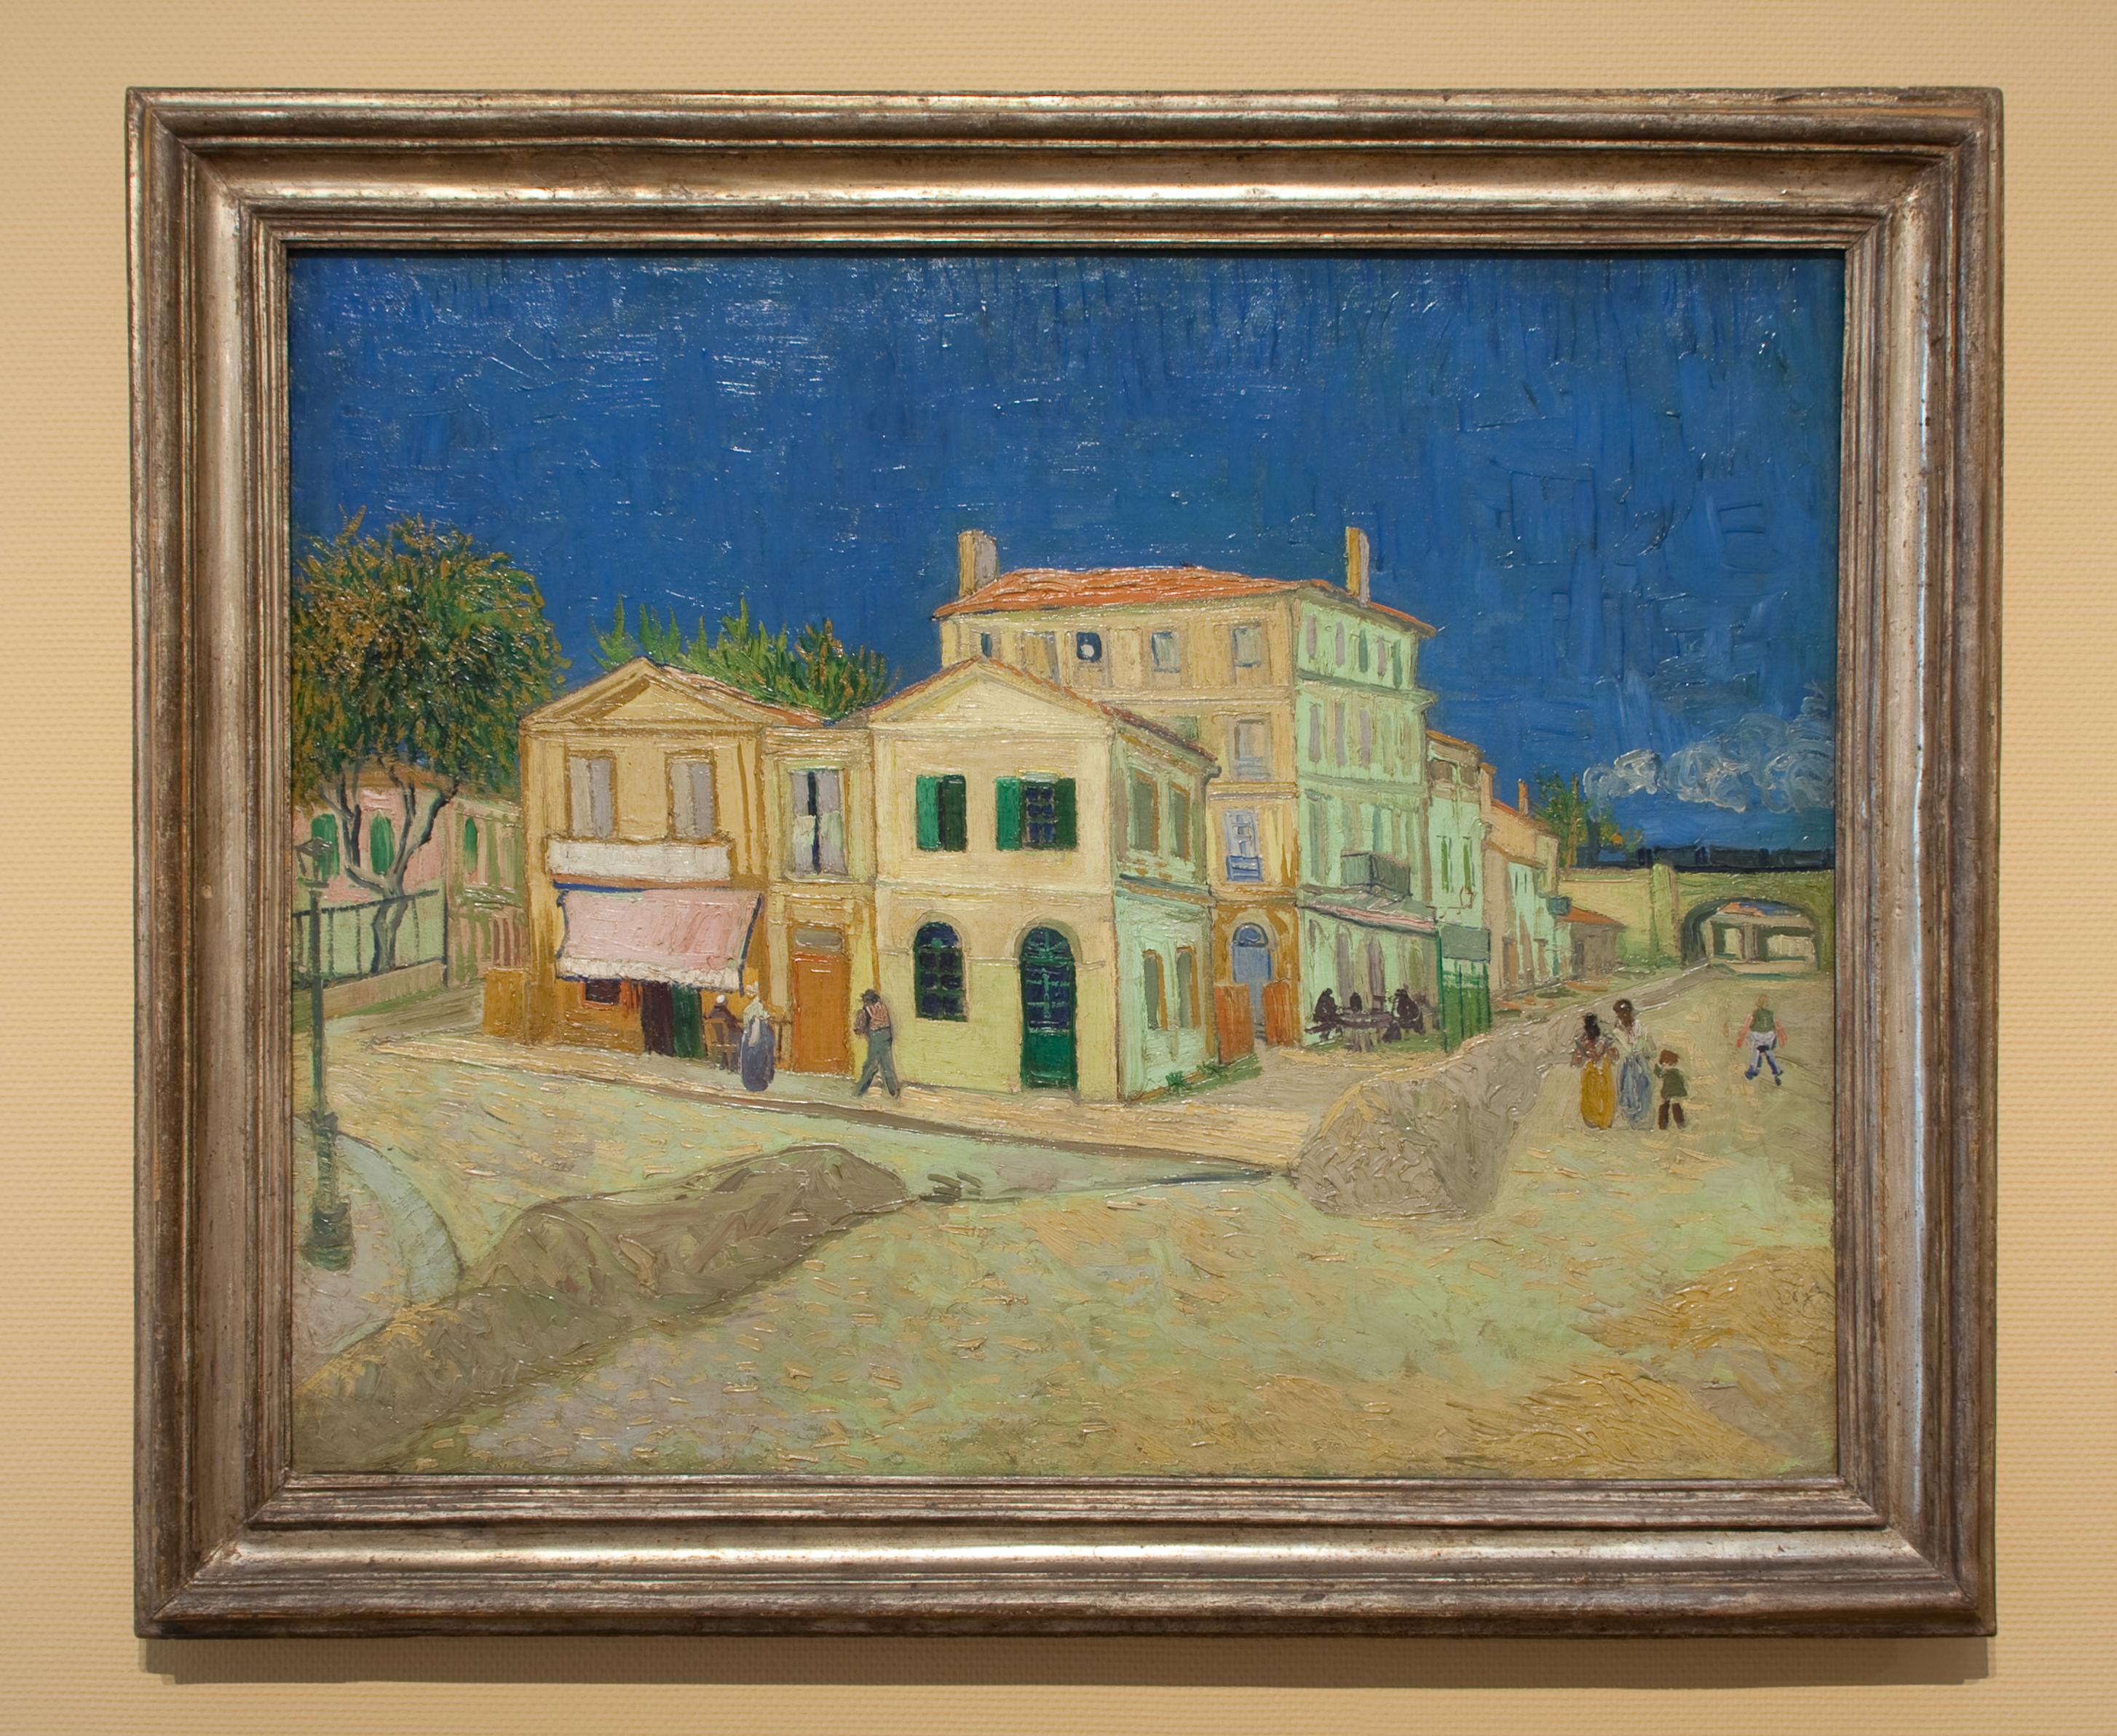 La Maison jaune (Van Gogh) - Wikiwand